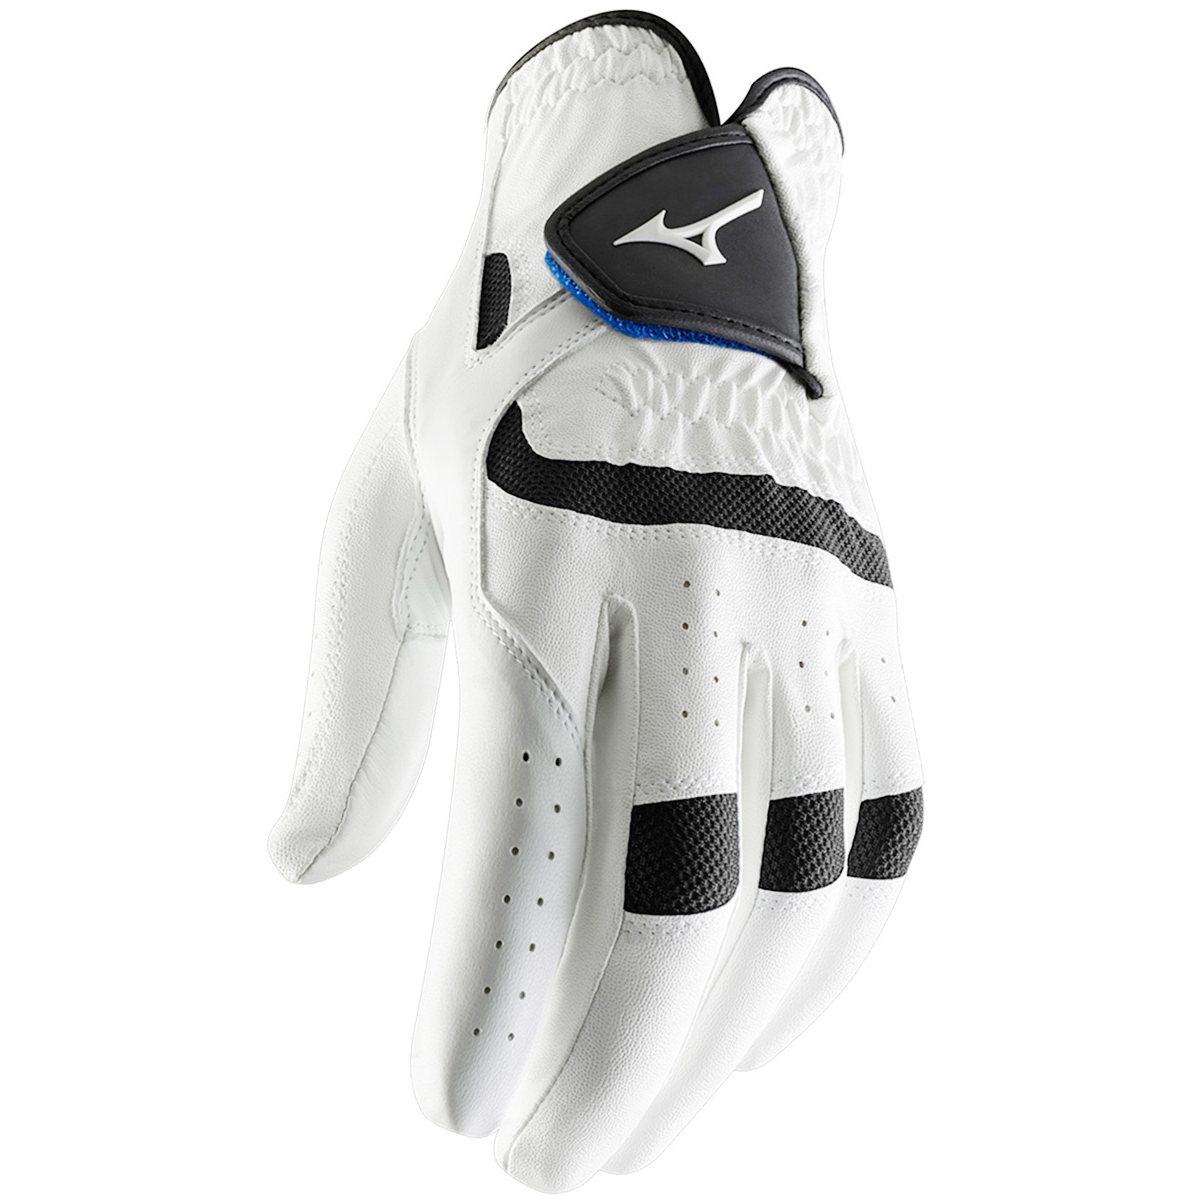 3cdc9f2791ab9 Mizuno Golf Elite Glove